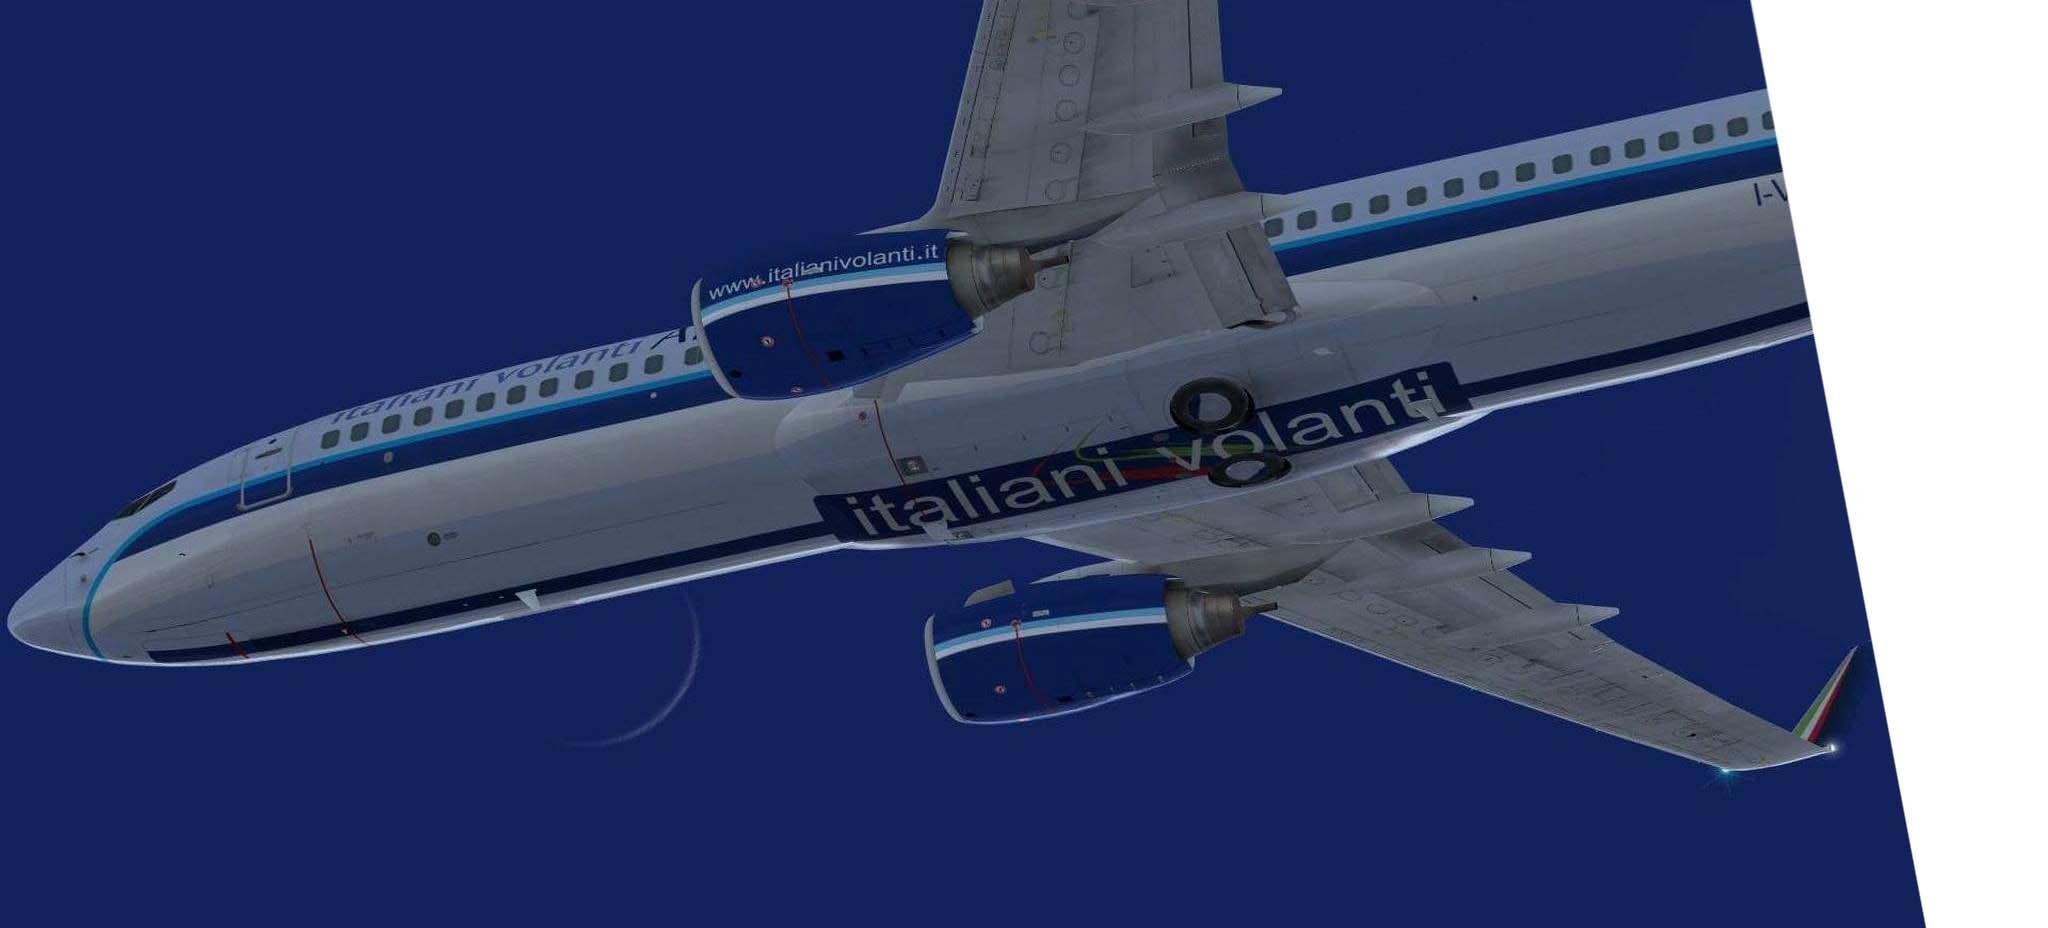 italiani volanti